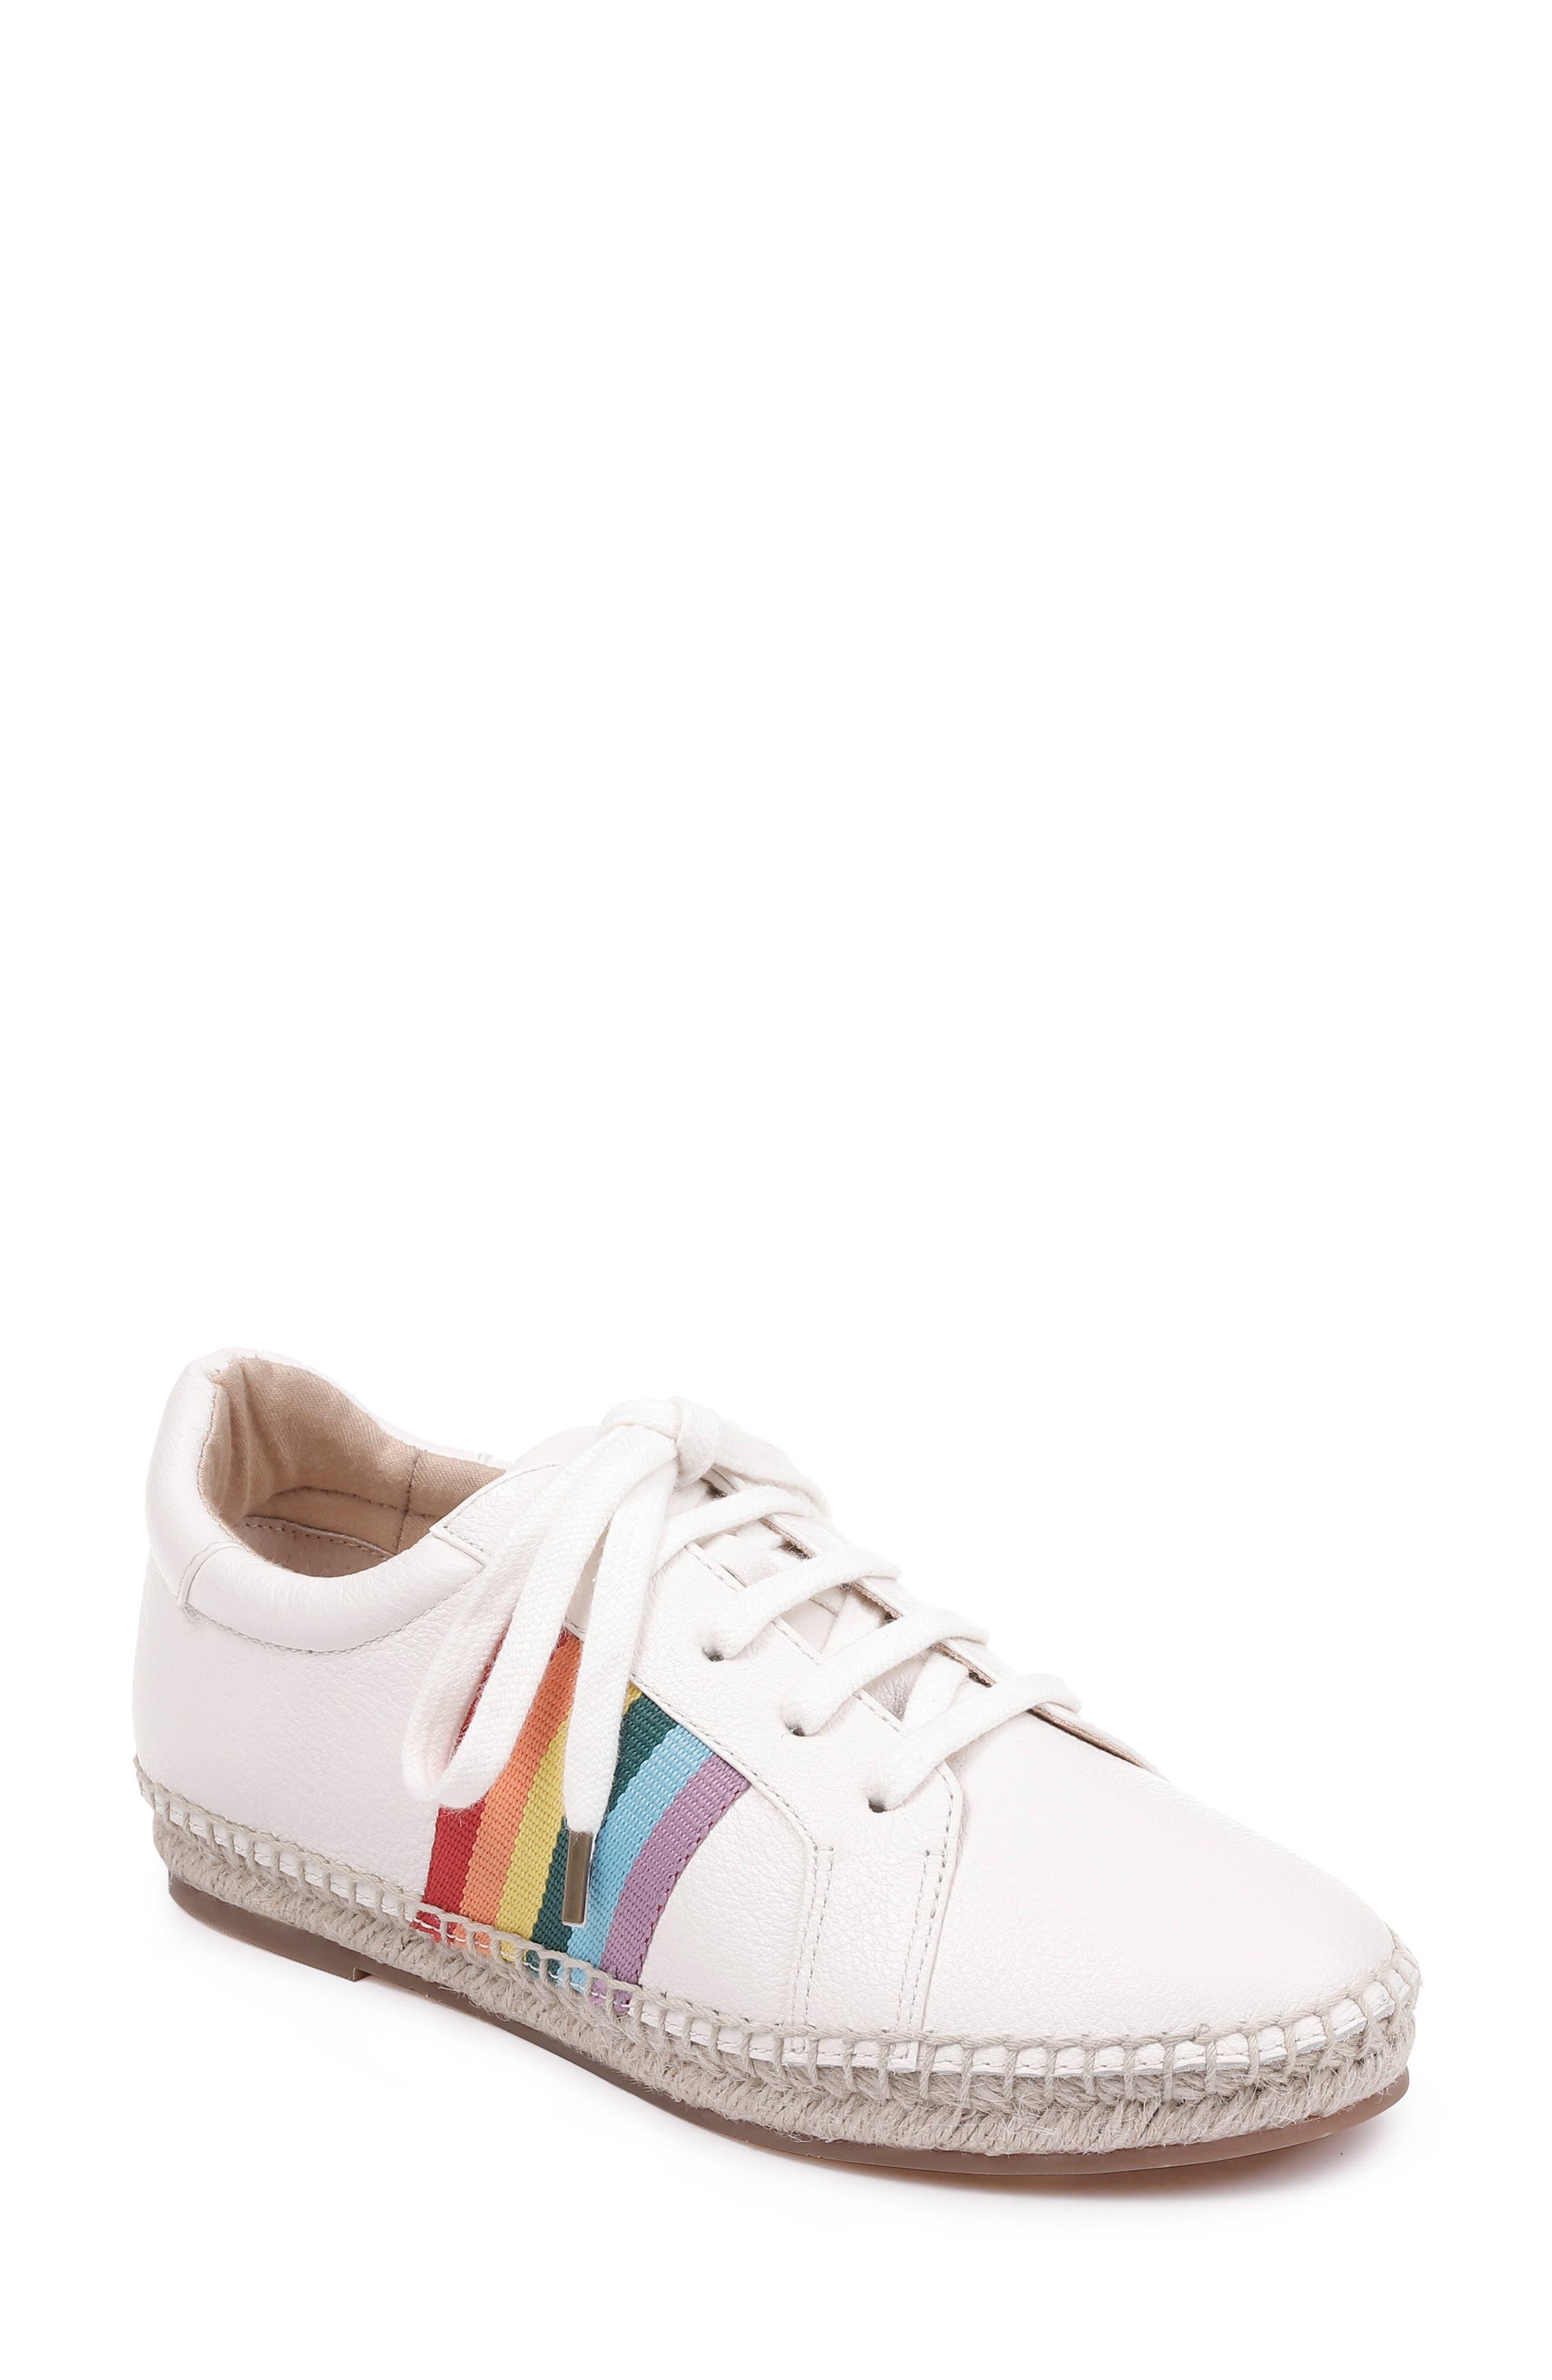 SPLENDID Sada Espadrille Sneaker, Main, color, OFF WHITE LEATHER